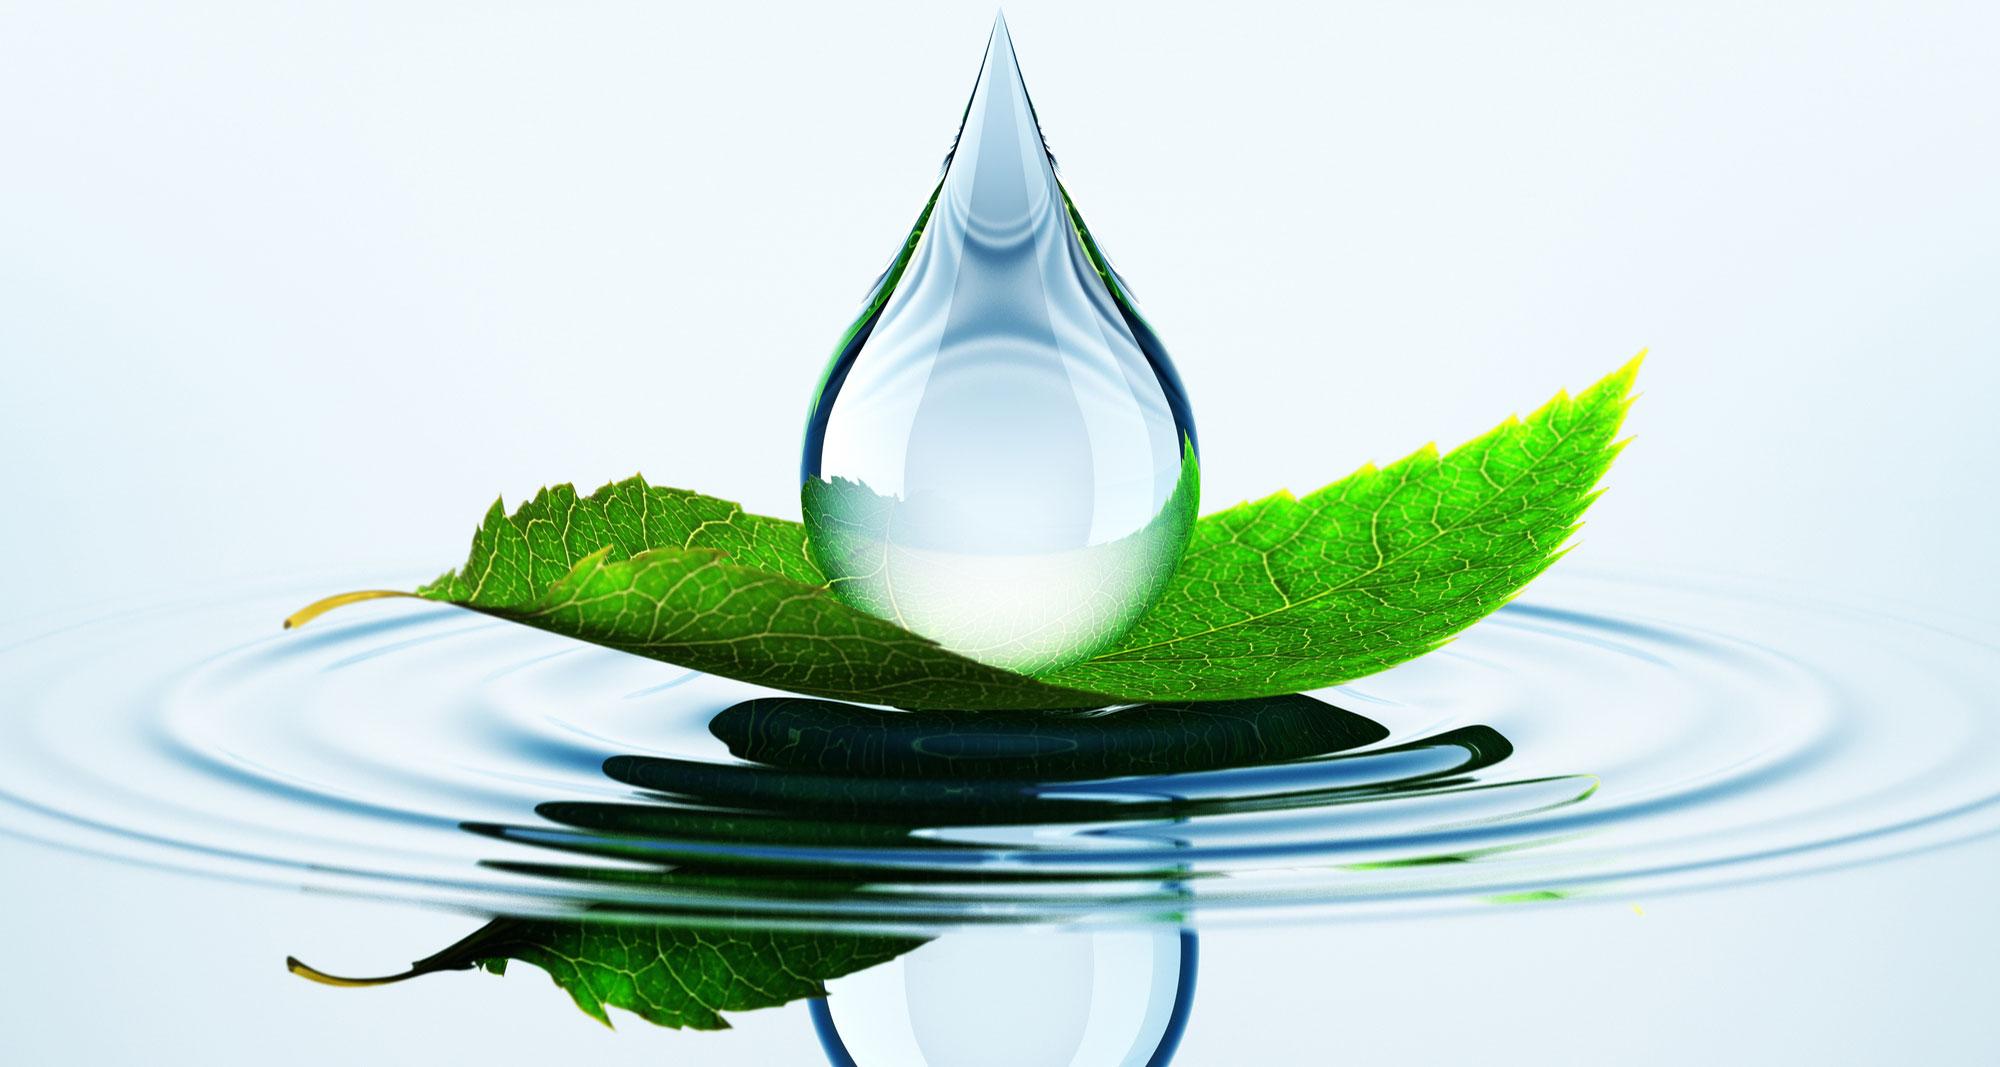 Biodegradable-Fluids